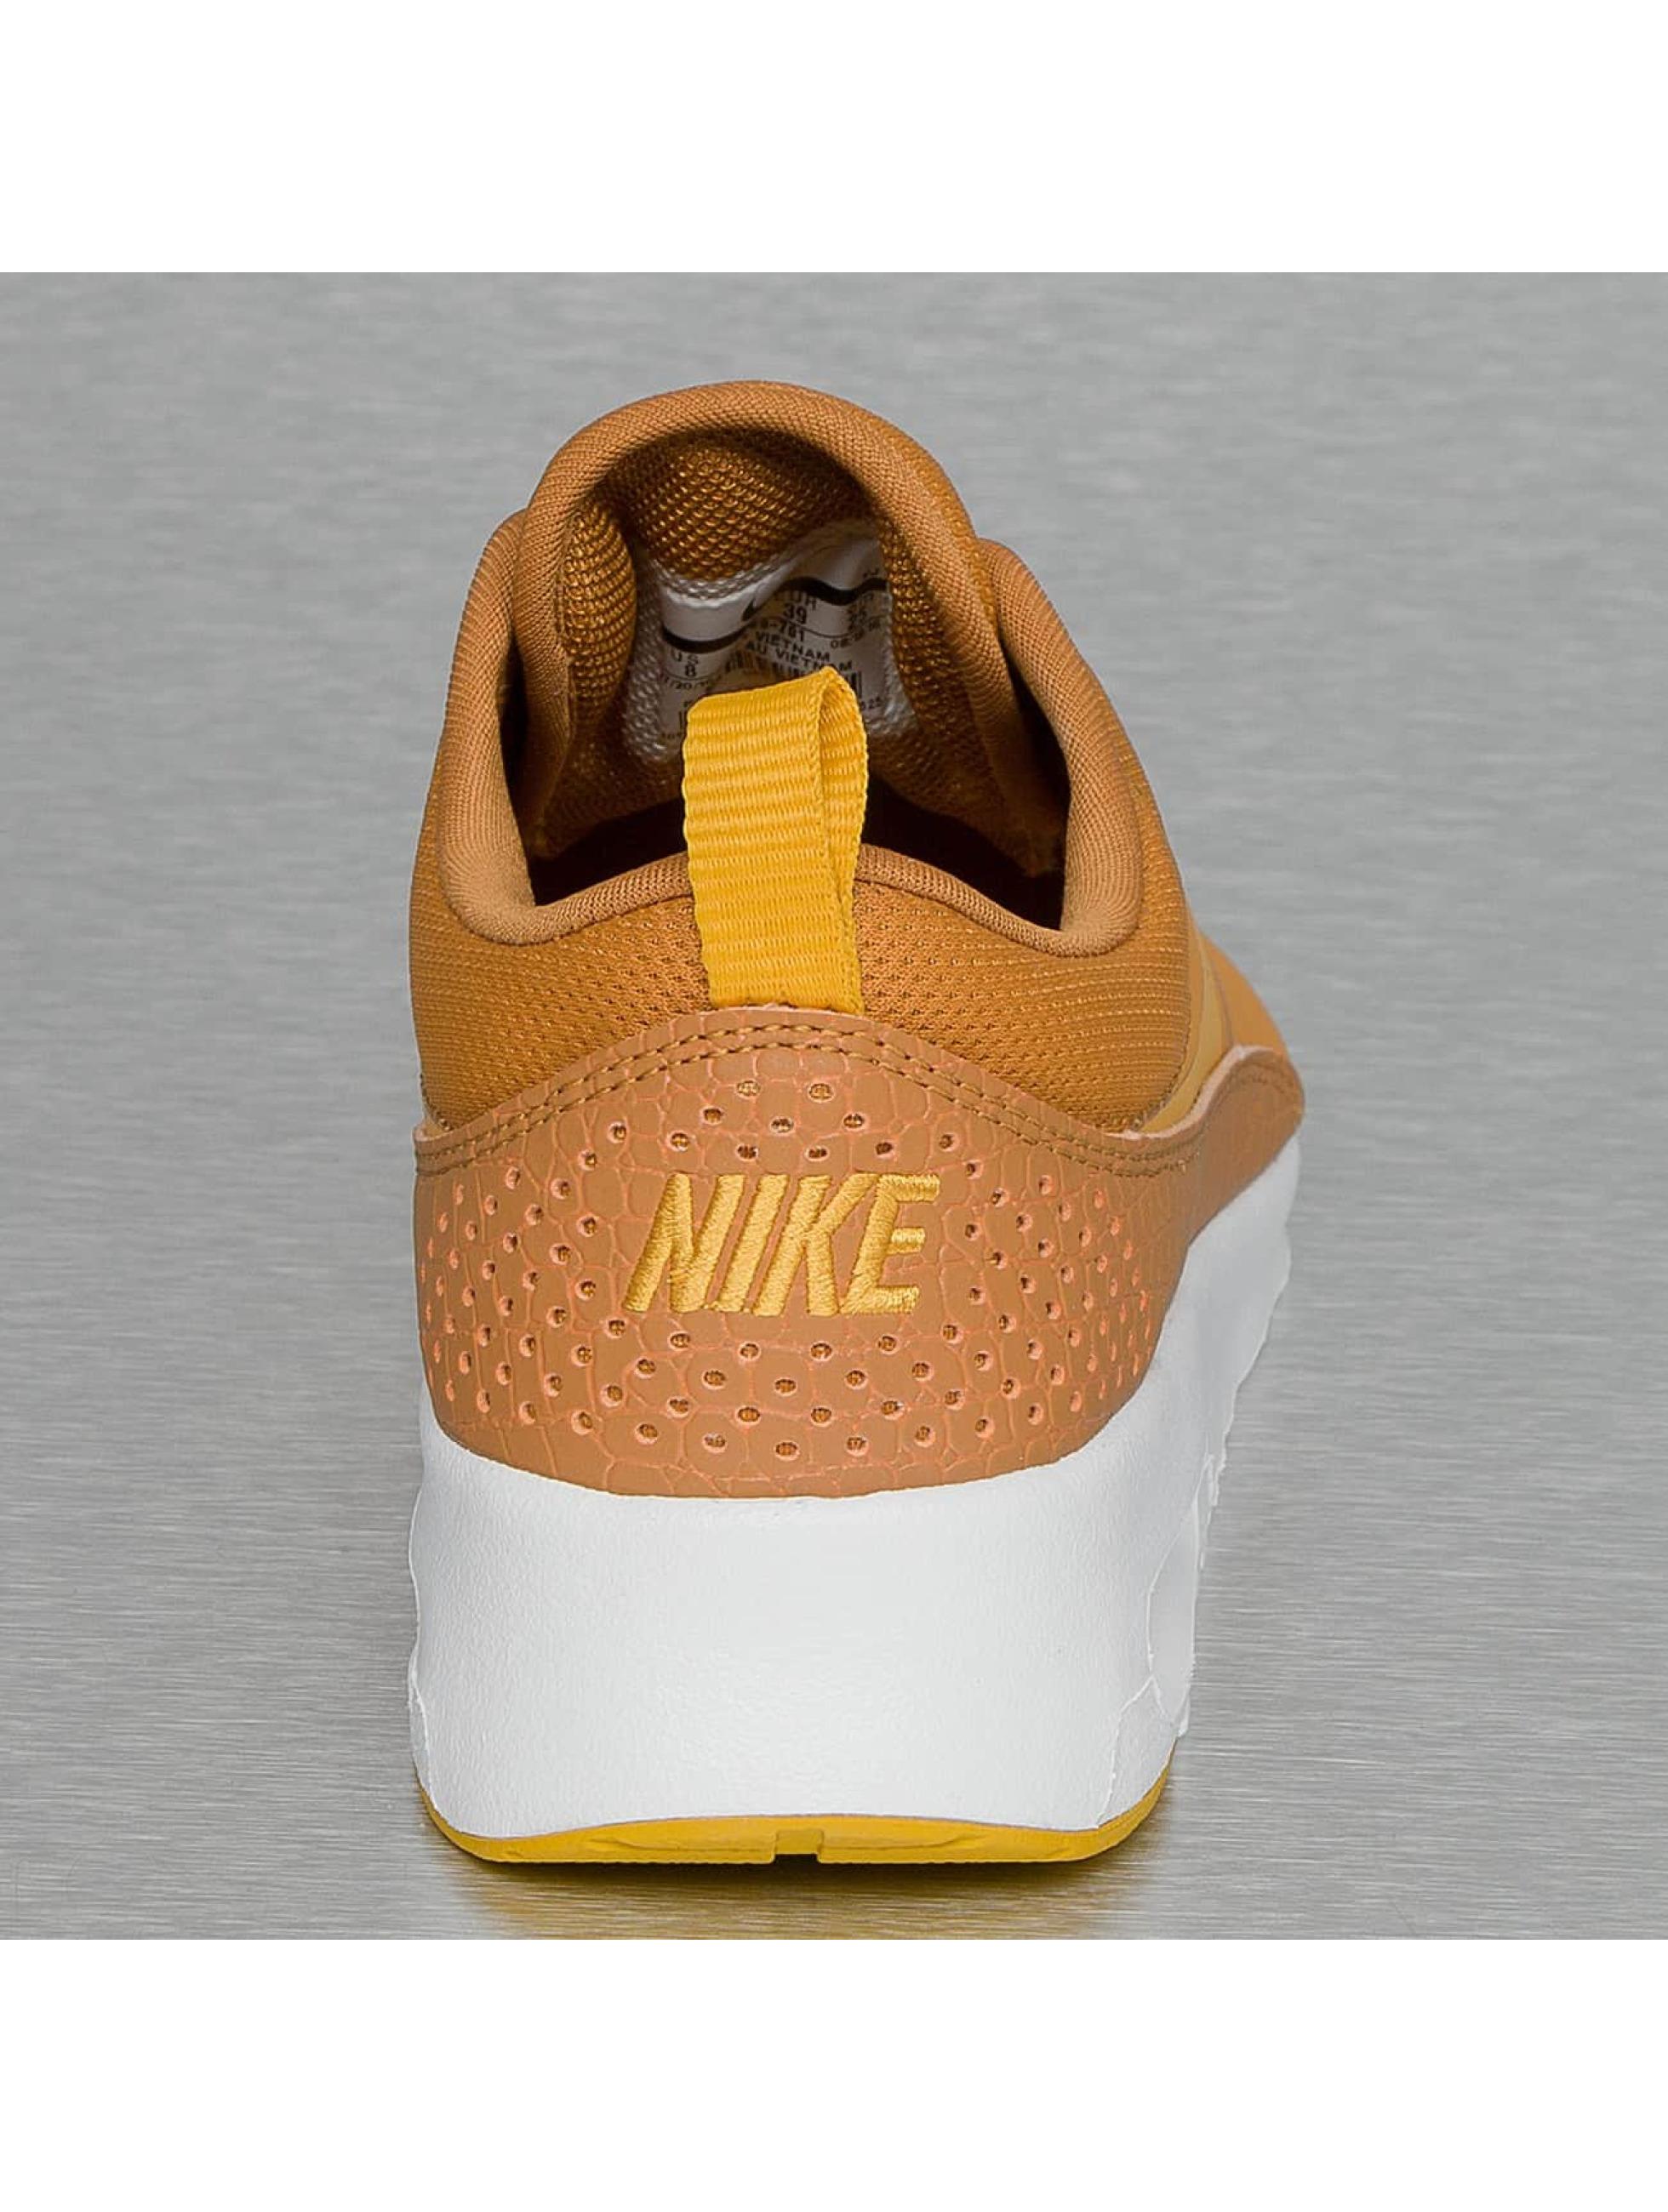 Nike Zapatillas de deporte Air Max Thea madera